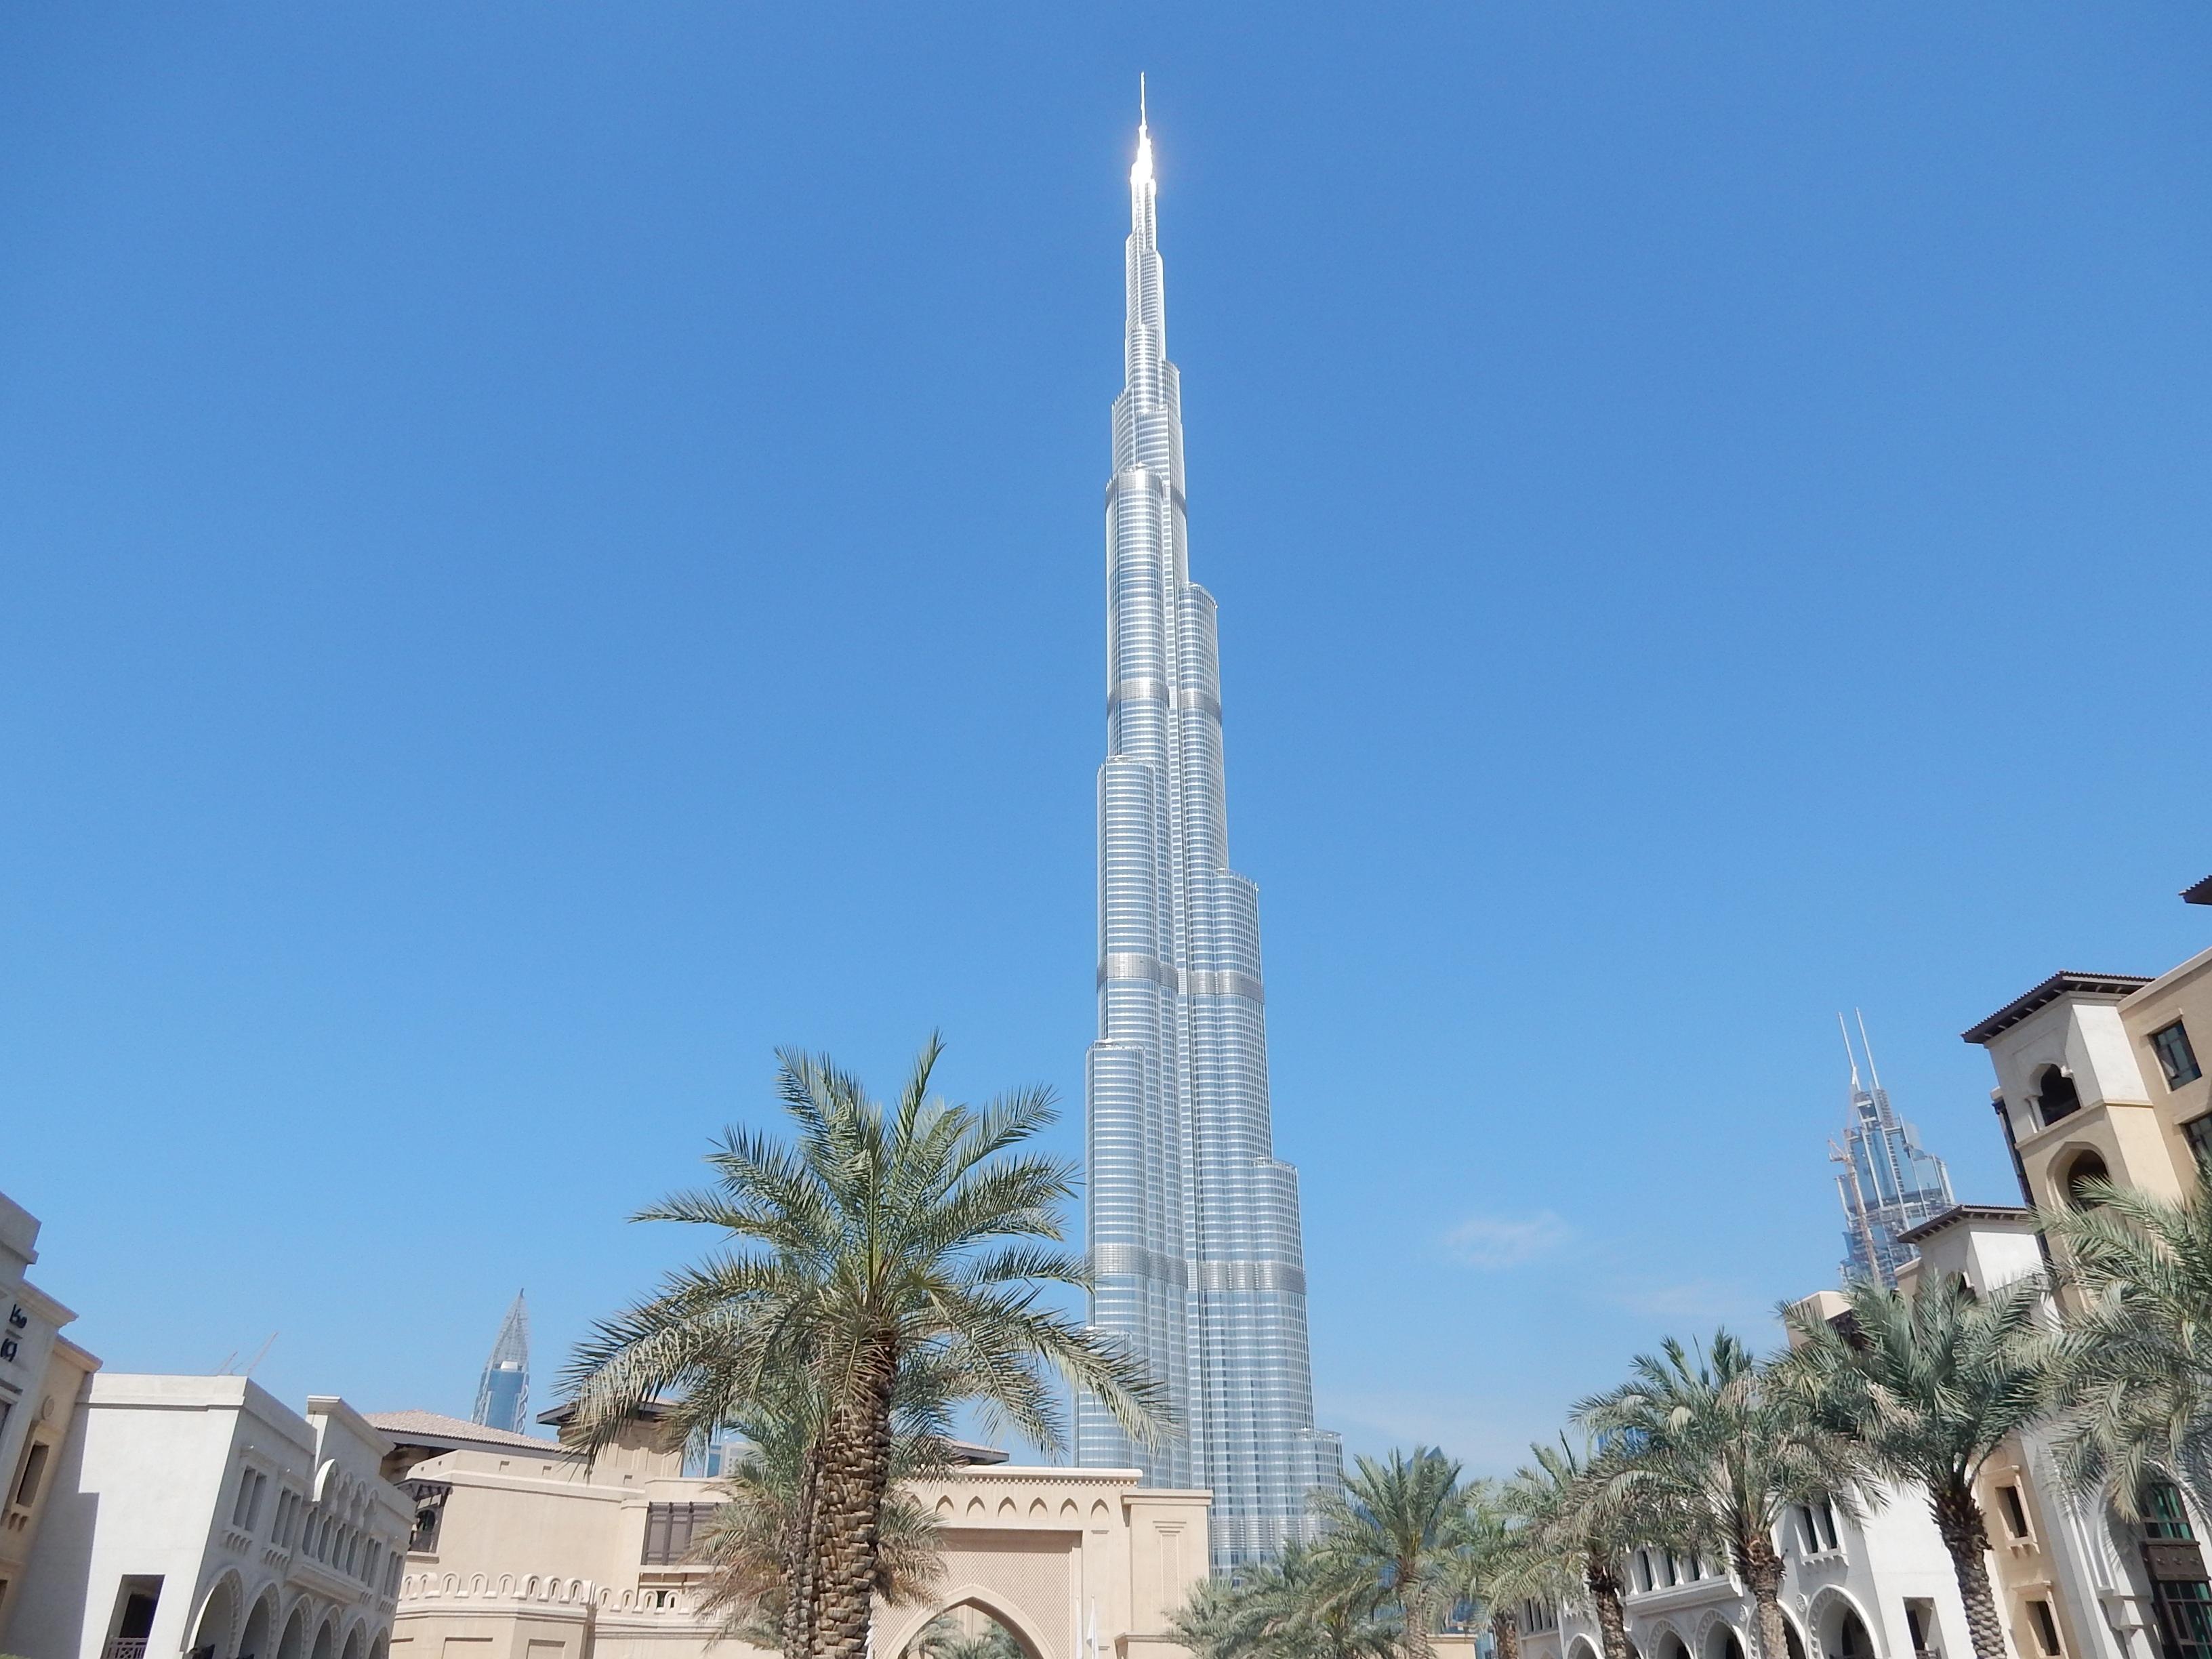 rascacielos monumento torre mstil dubai punto de referencia bloque de pisos aguja campanario obelisco emiratos